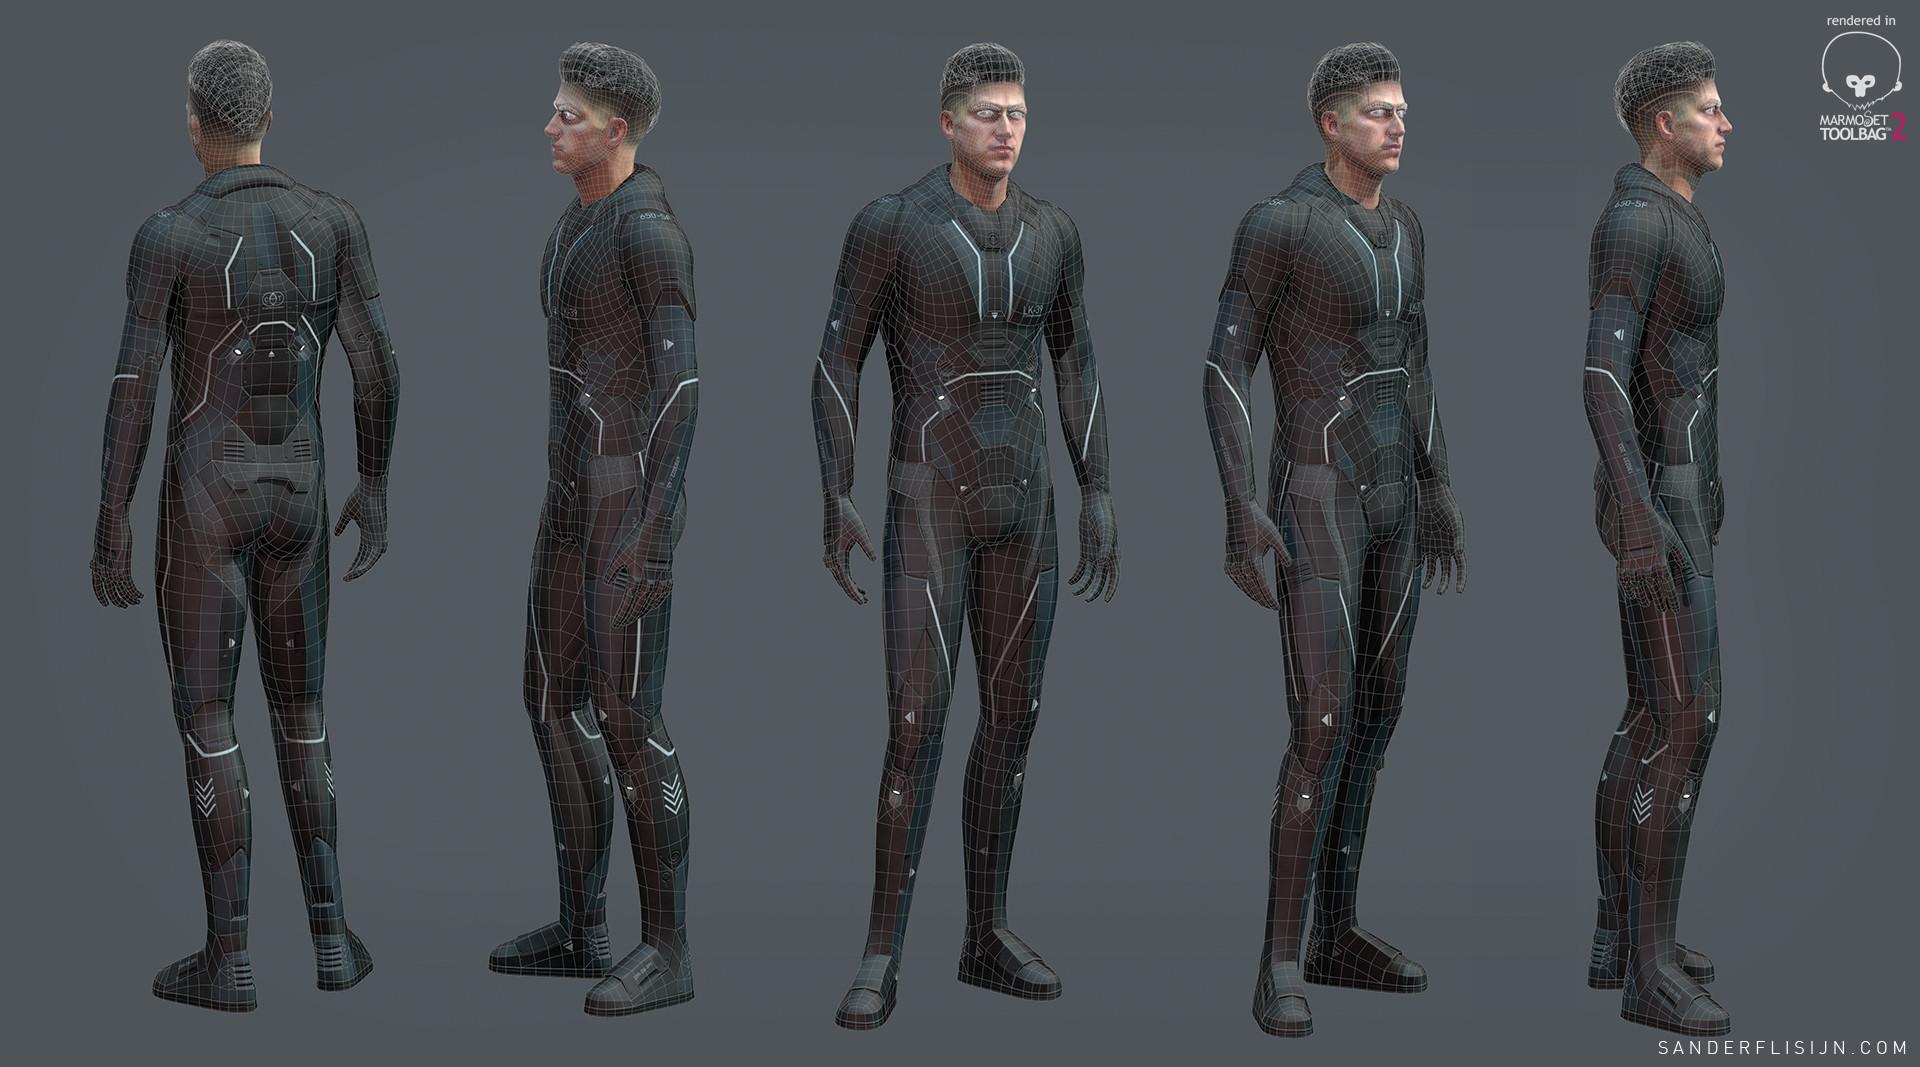 Sander Flisijn Sci Fi Character